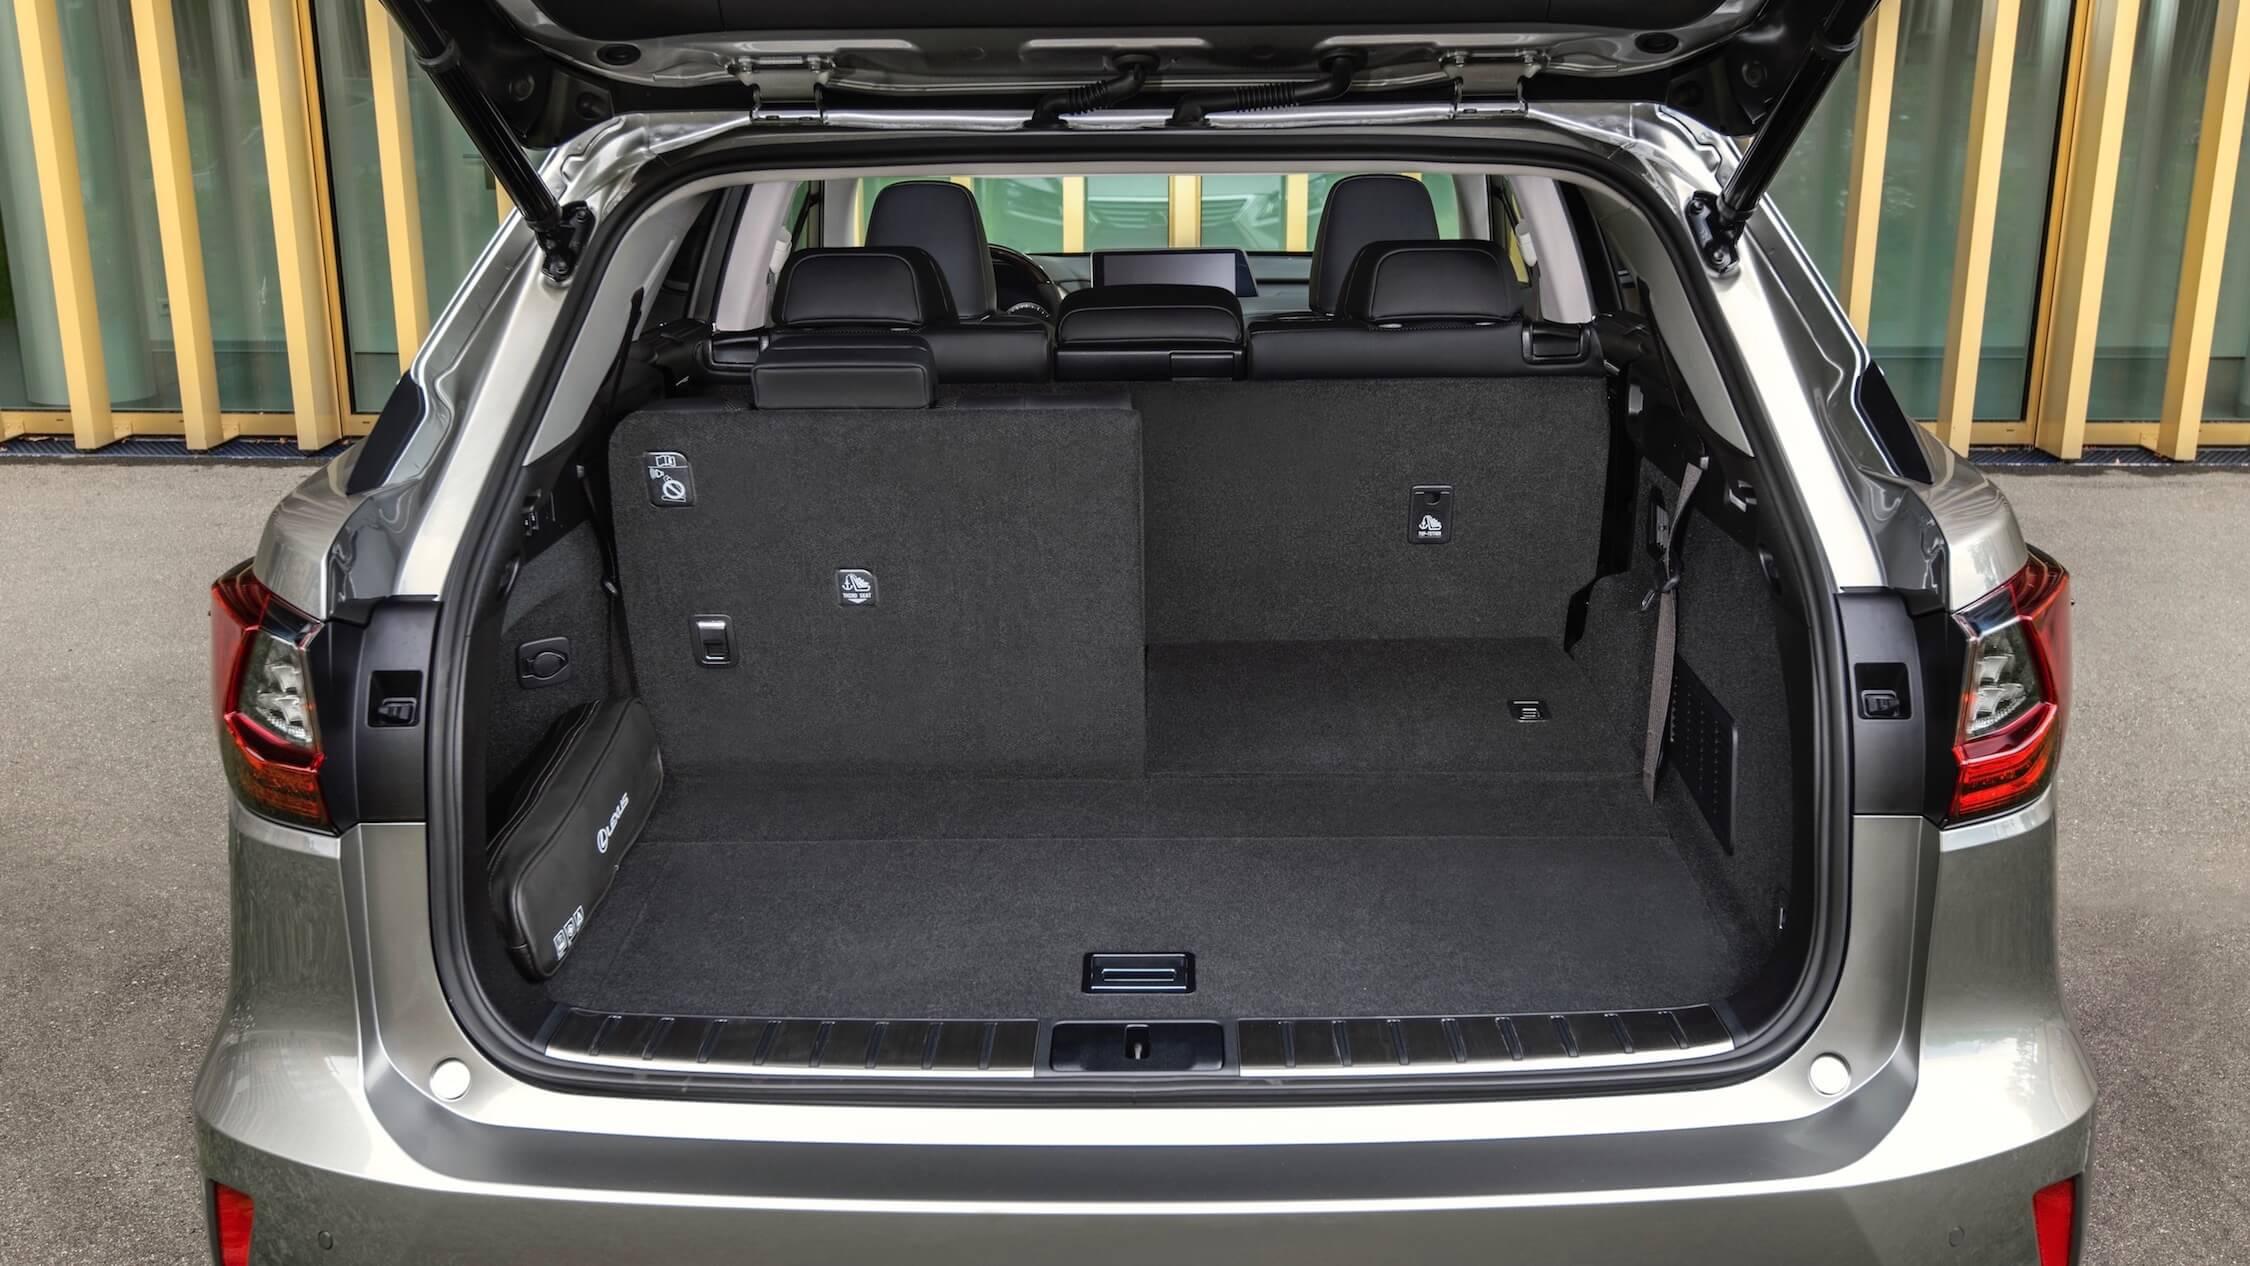 Lexus RX 450h porta-bagegens